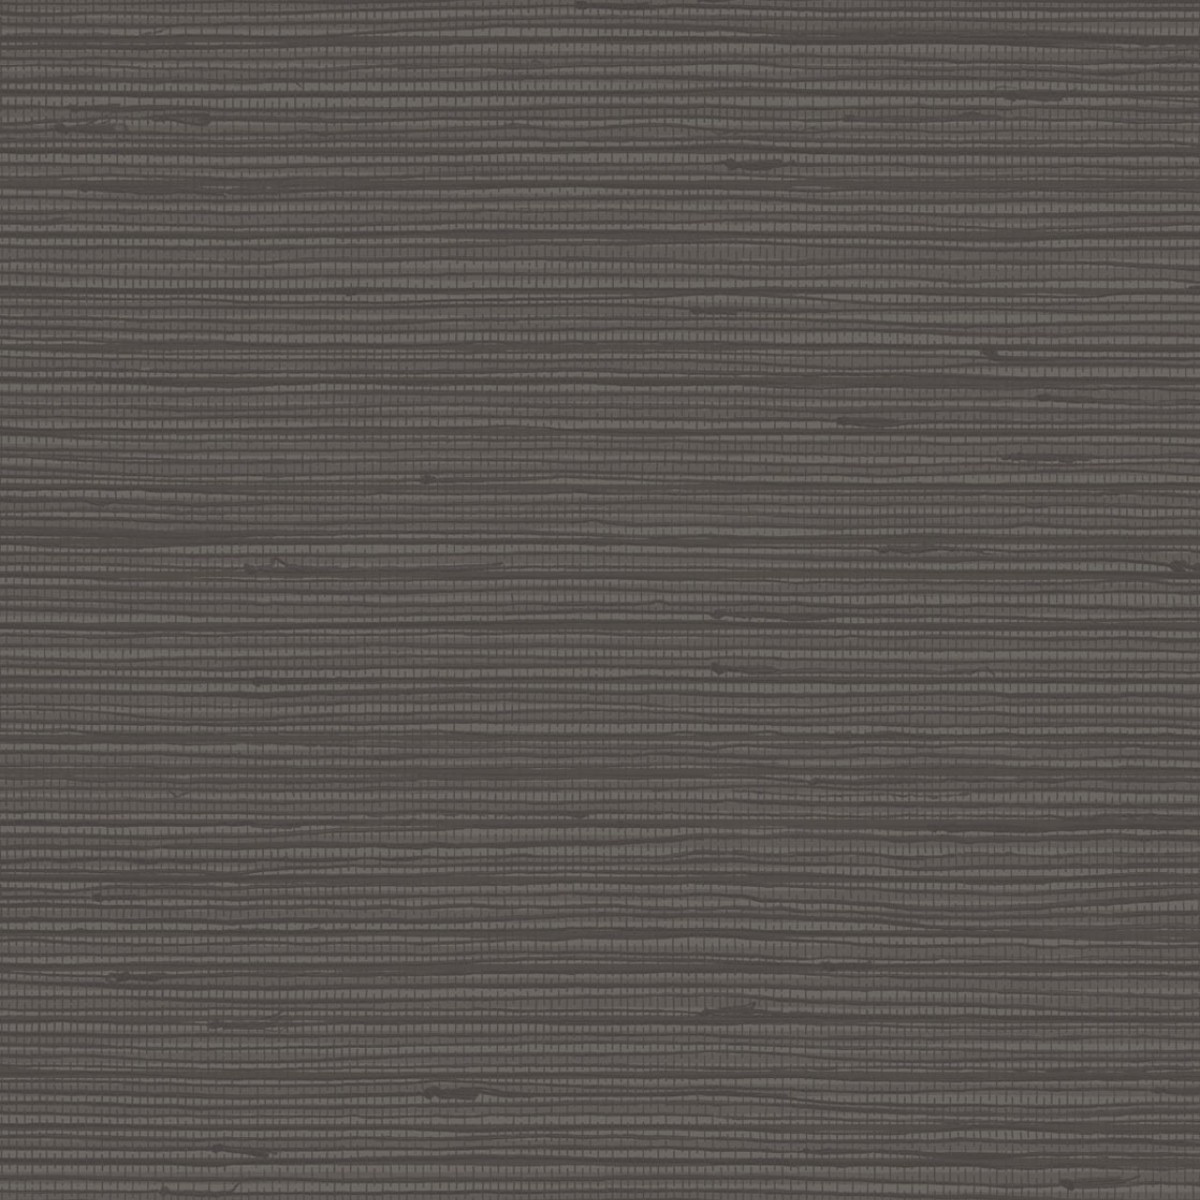 Tapet lavabil Blend 363036, 5.2mp / rolă, Eijffinger